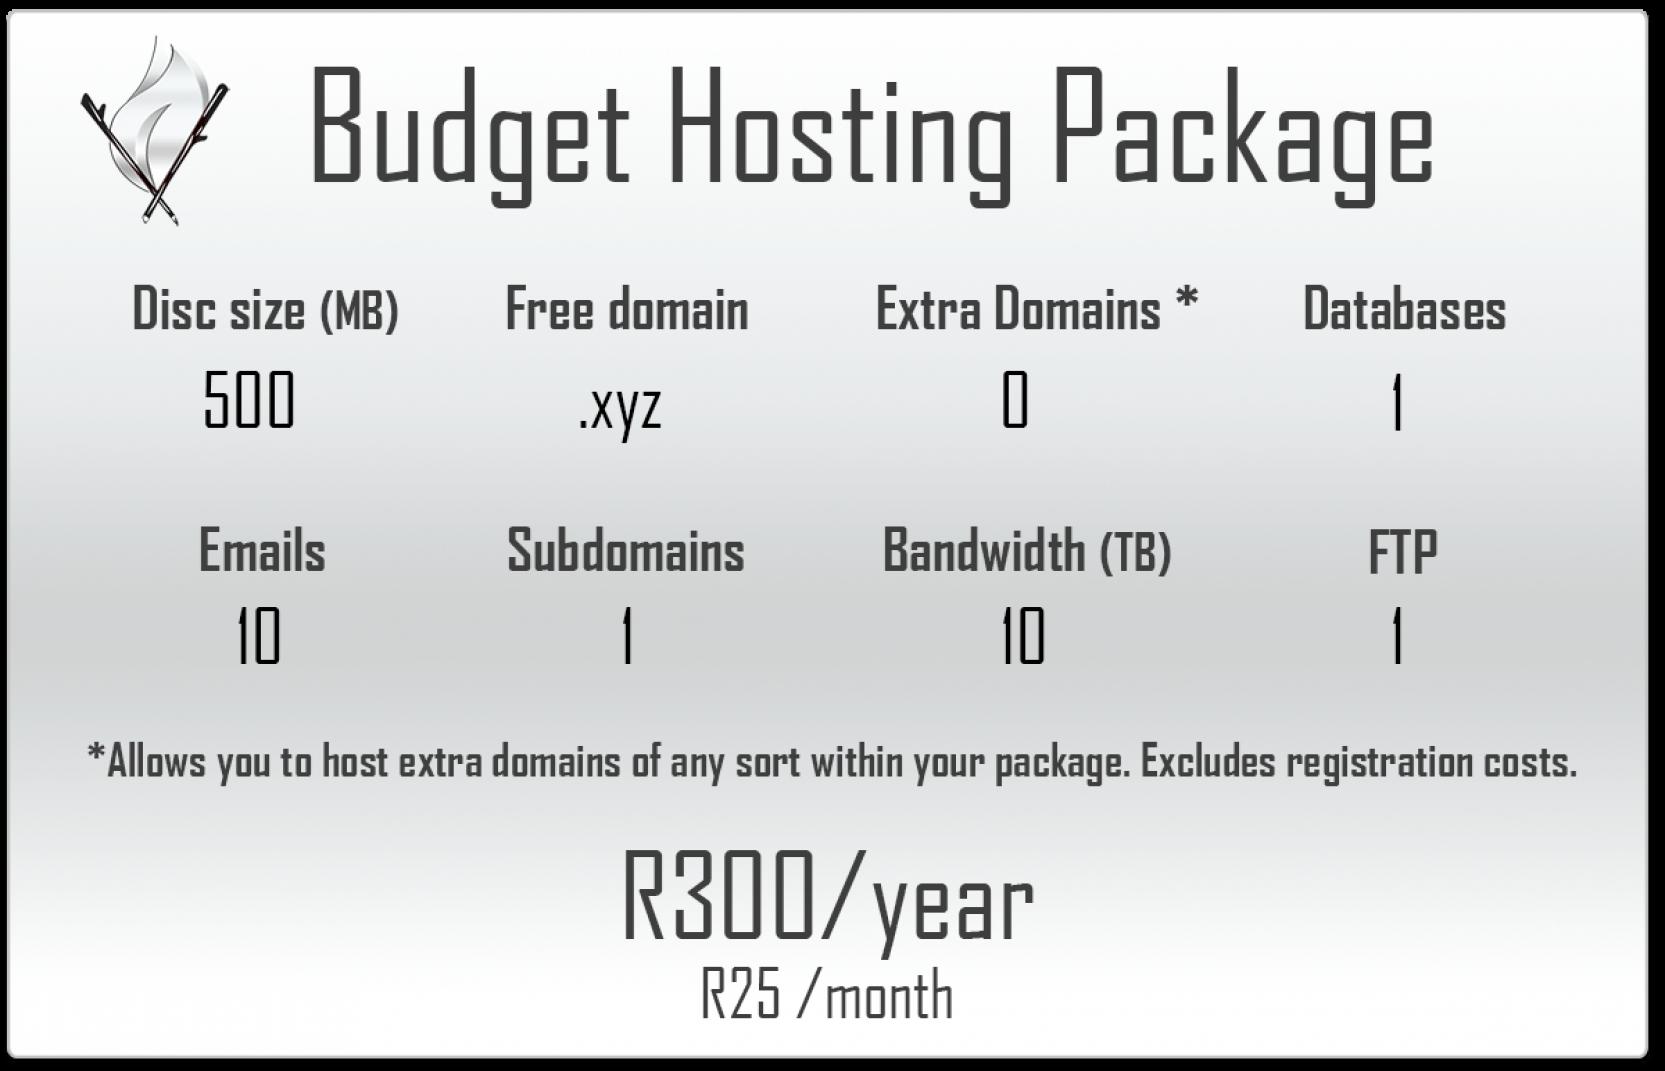 Budget Hosting Package